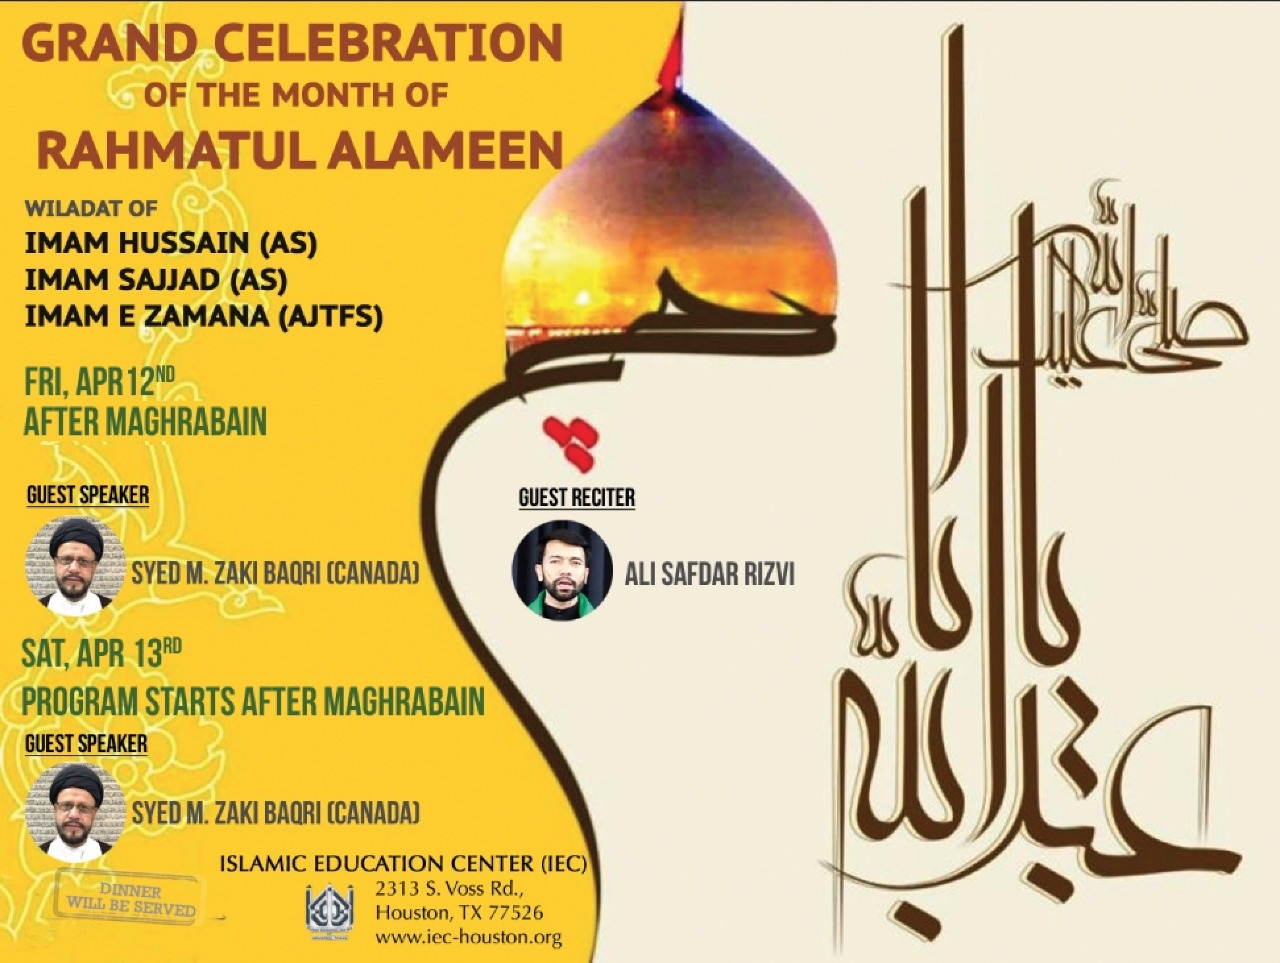 GRAND Celebration of the Month of Rahmatul Alameen – Islamic